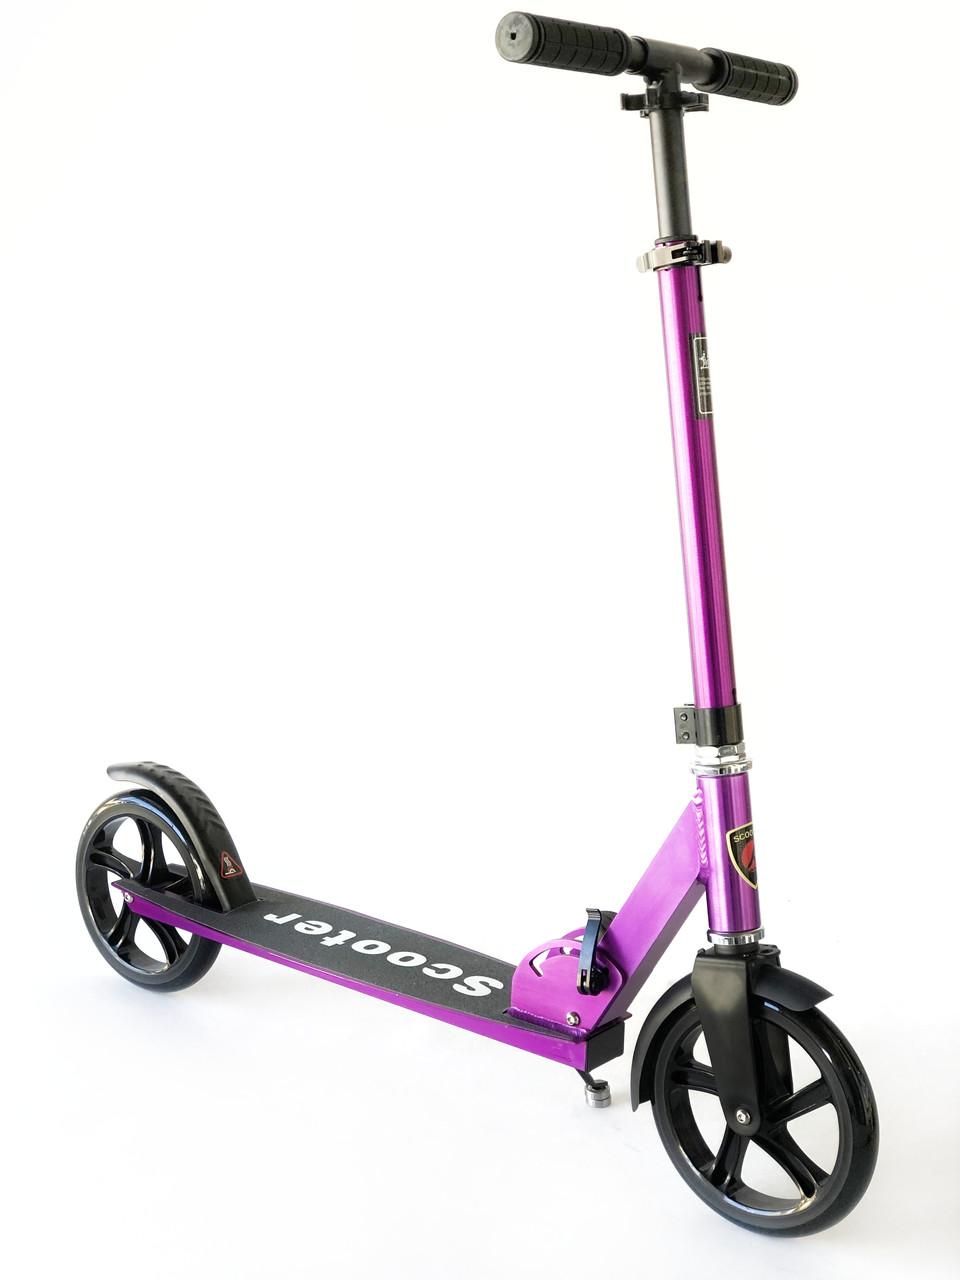 Самокат на великих колесах Scooter Pro 109-C3   Фіолетовий